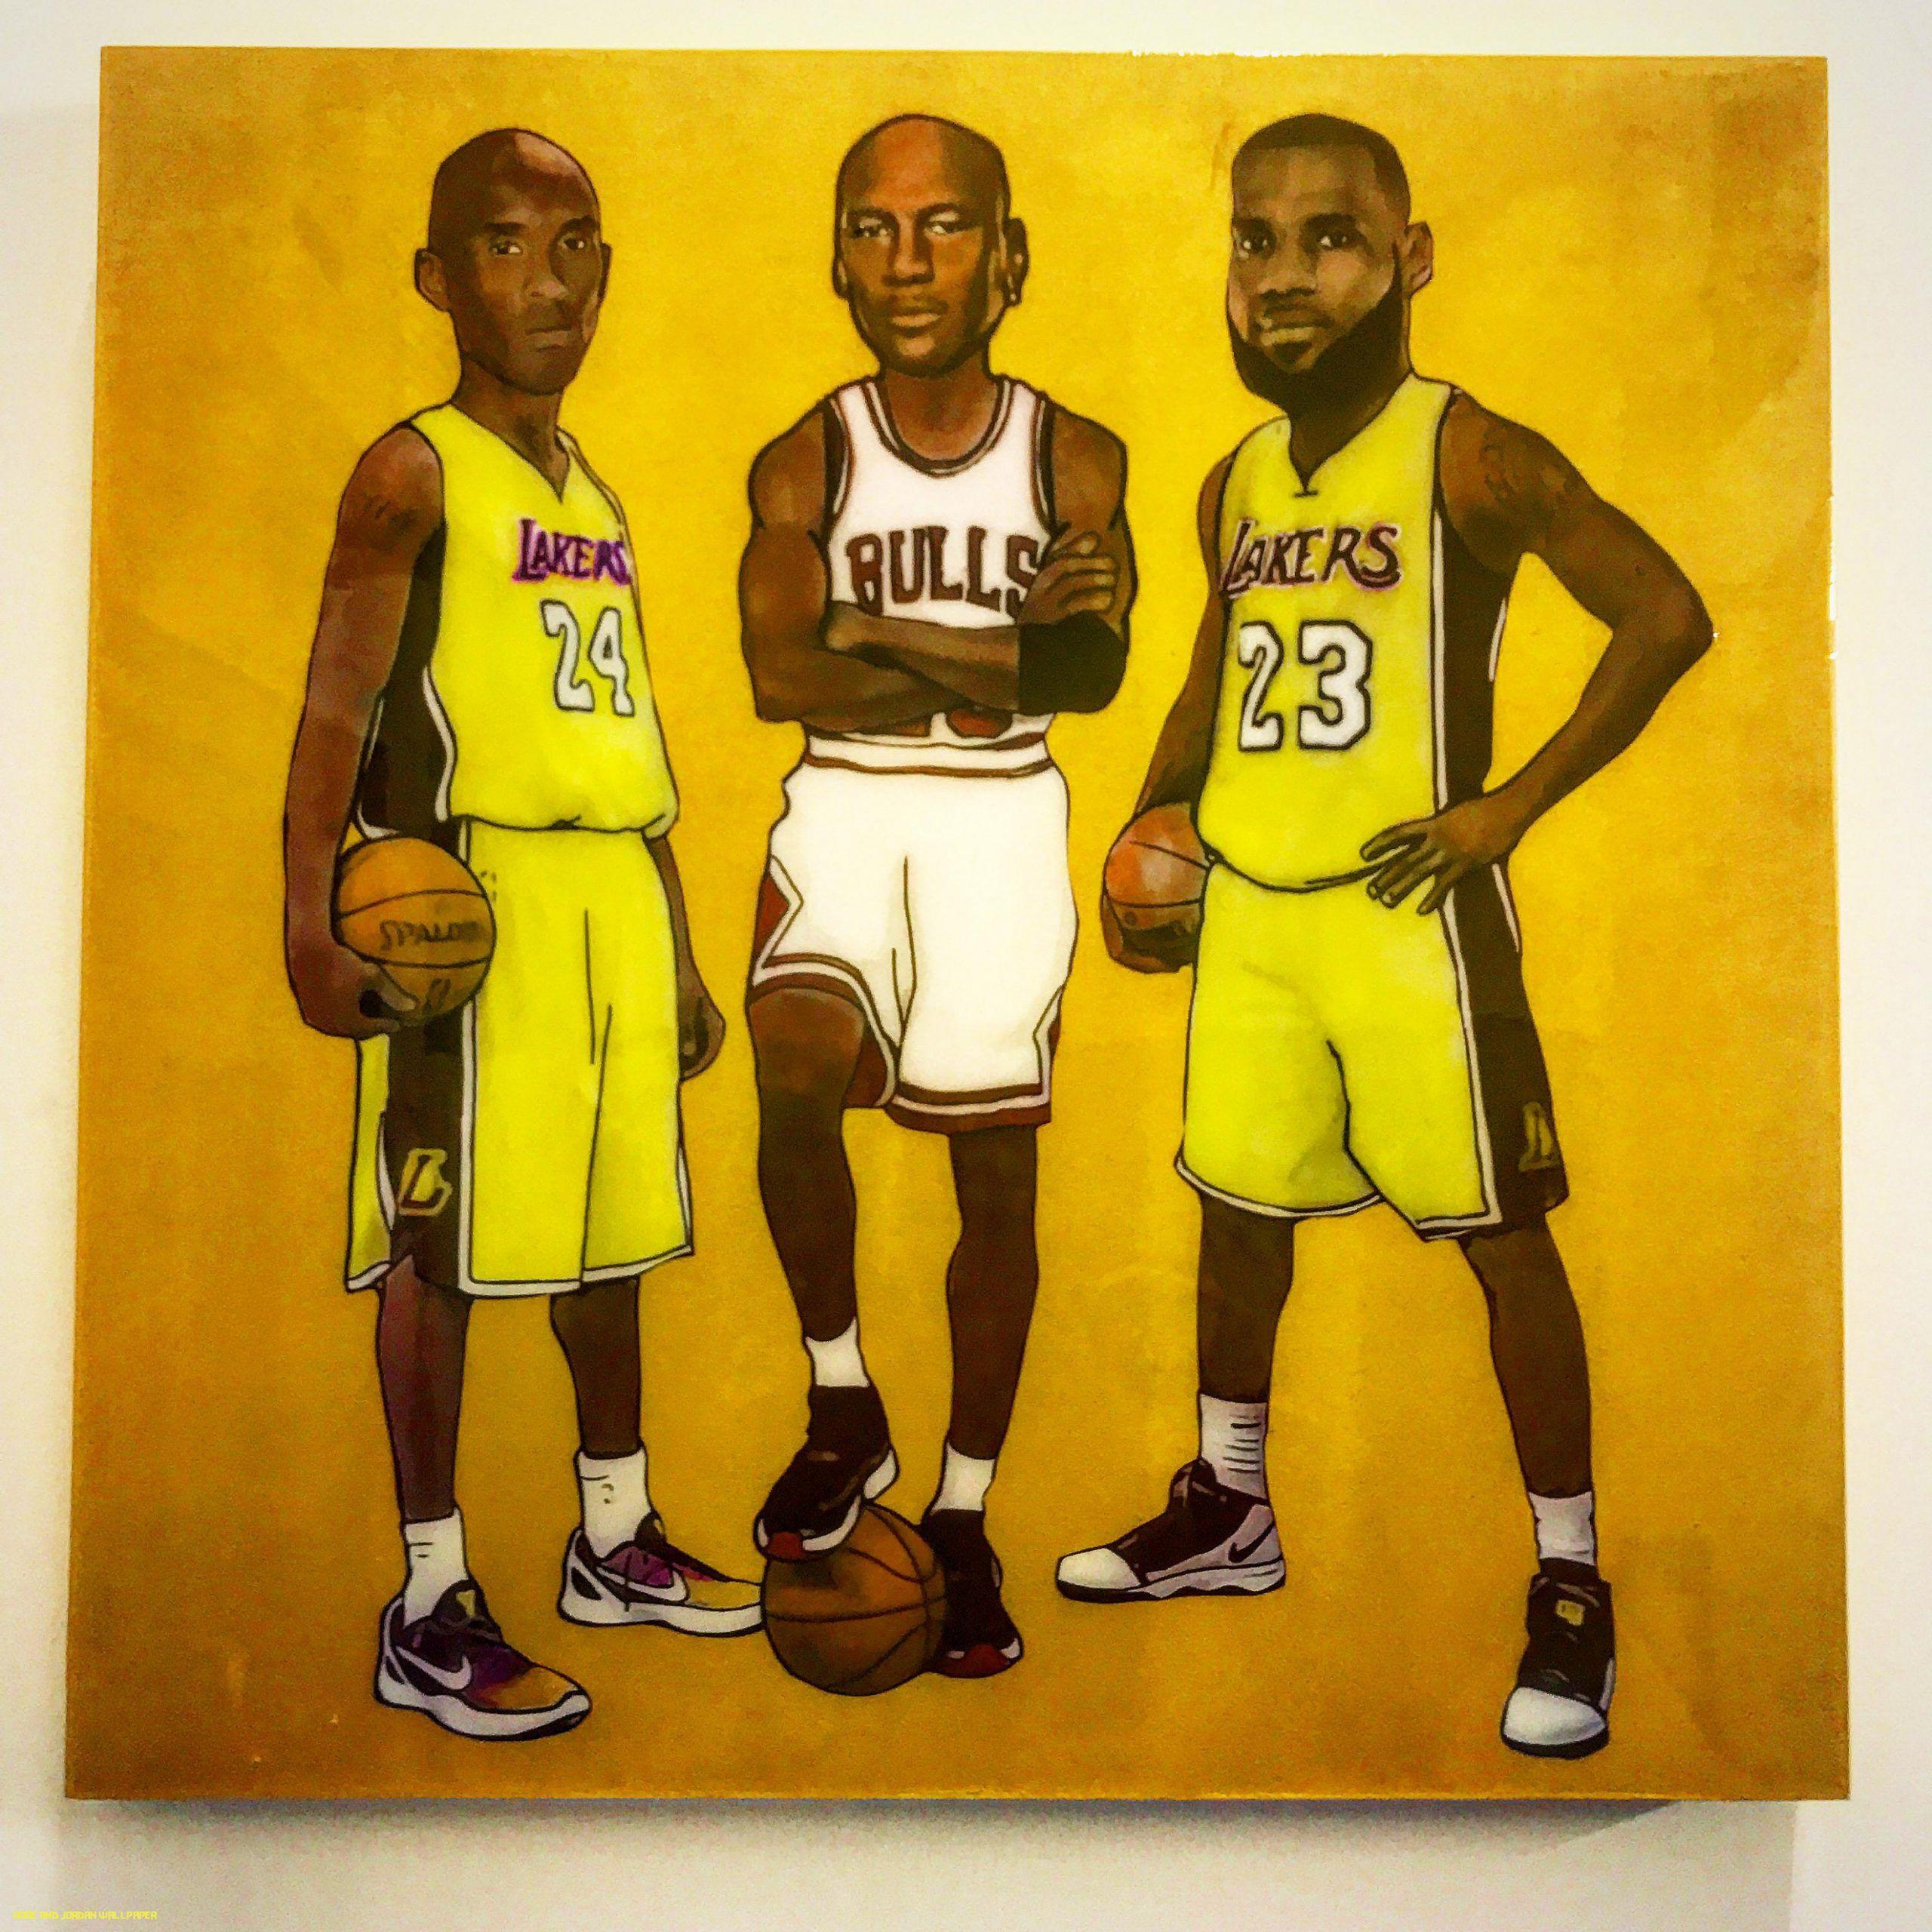 One Checklist That You Should Keep In Mind Before Attending Kobe And Jordan Wallpaper Kobe And Jordan Wallpa In 2020 Lebron Kobe Bryant Michael Jordan Michael Jordan